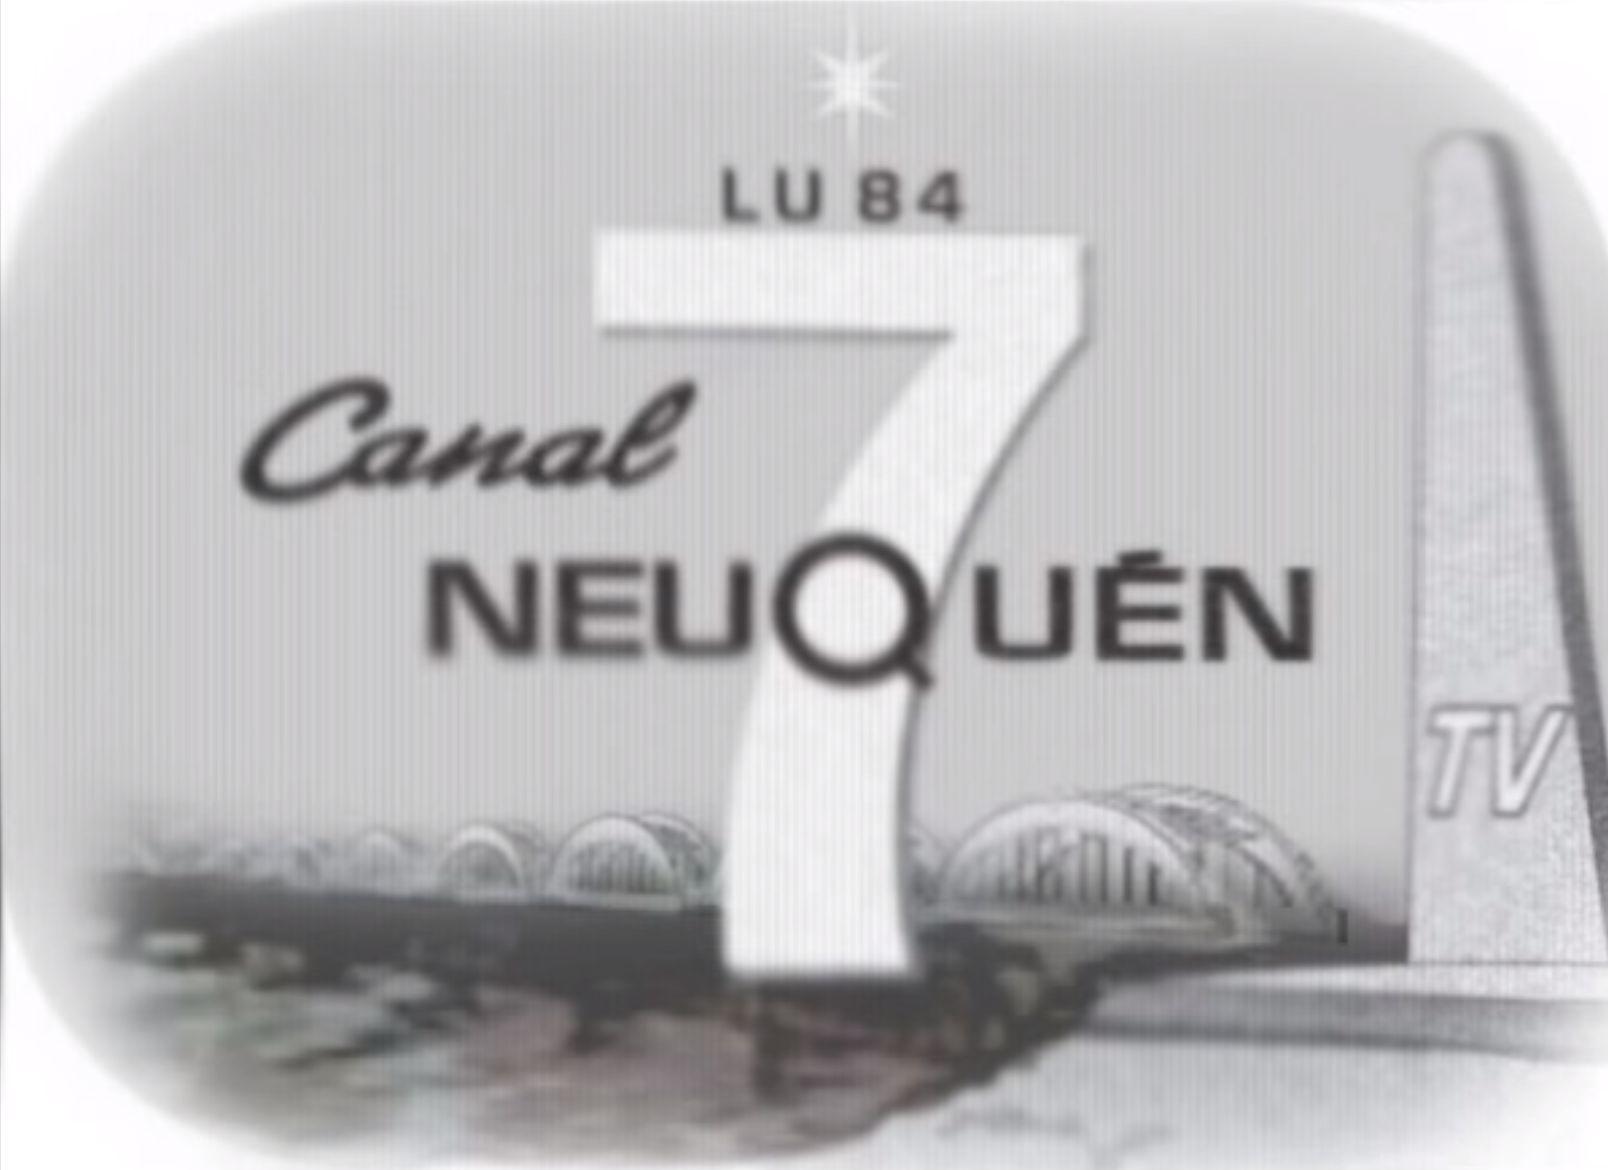 Telefe Neuquén/Other